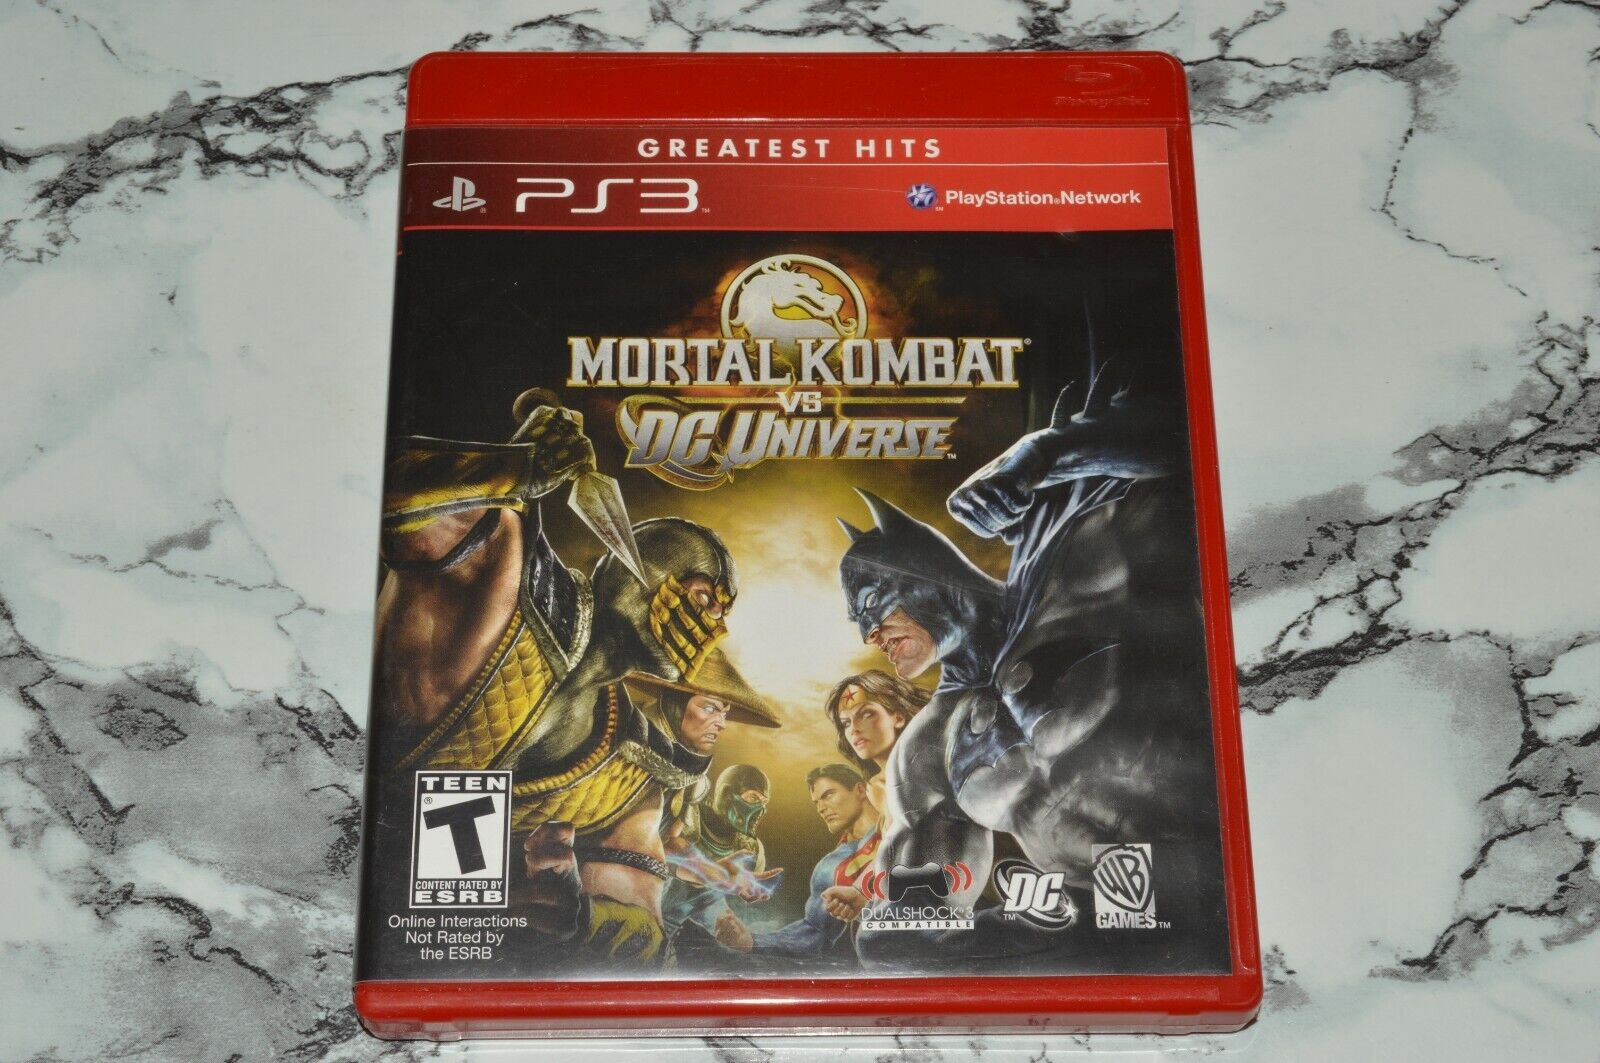 Mortal Kombat VS DC Universe Sony PlayStation 3 PS3 -- Complete W/ Manual - $11.18